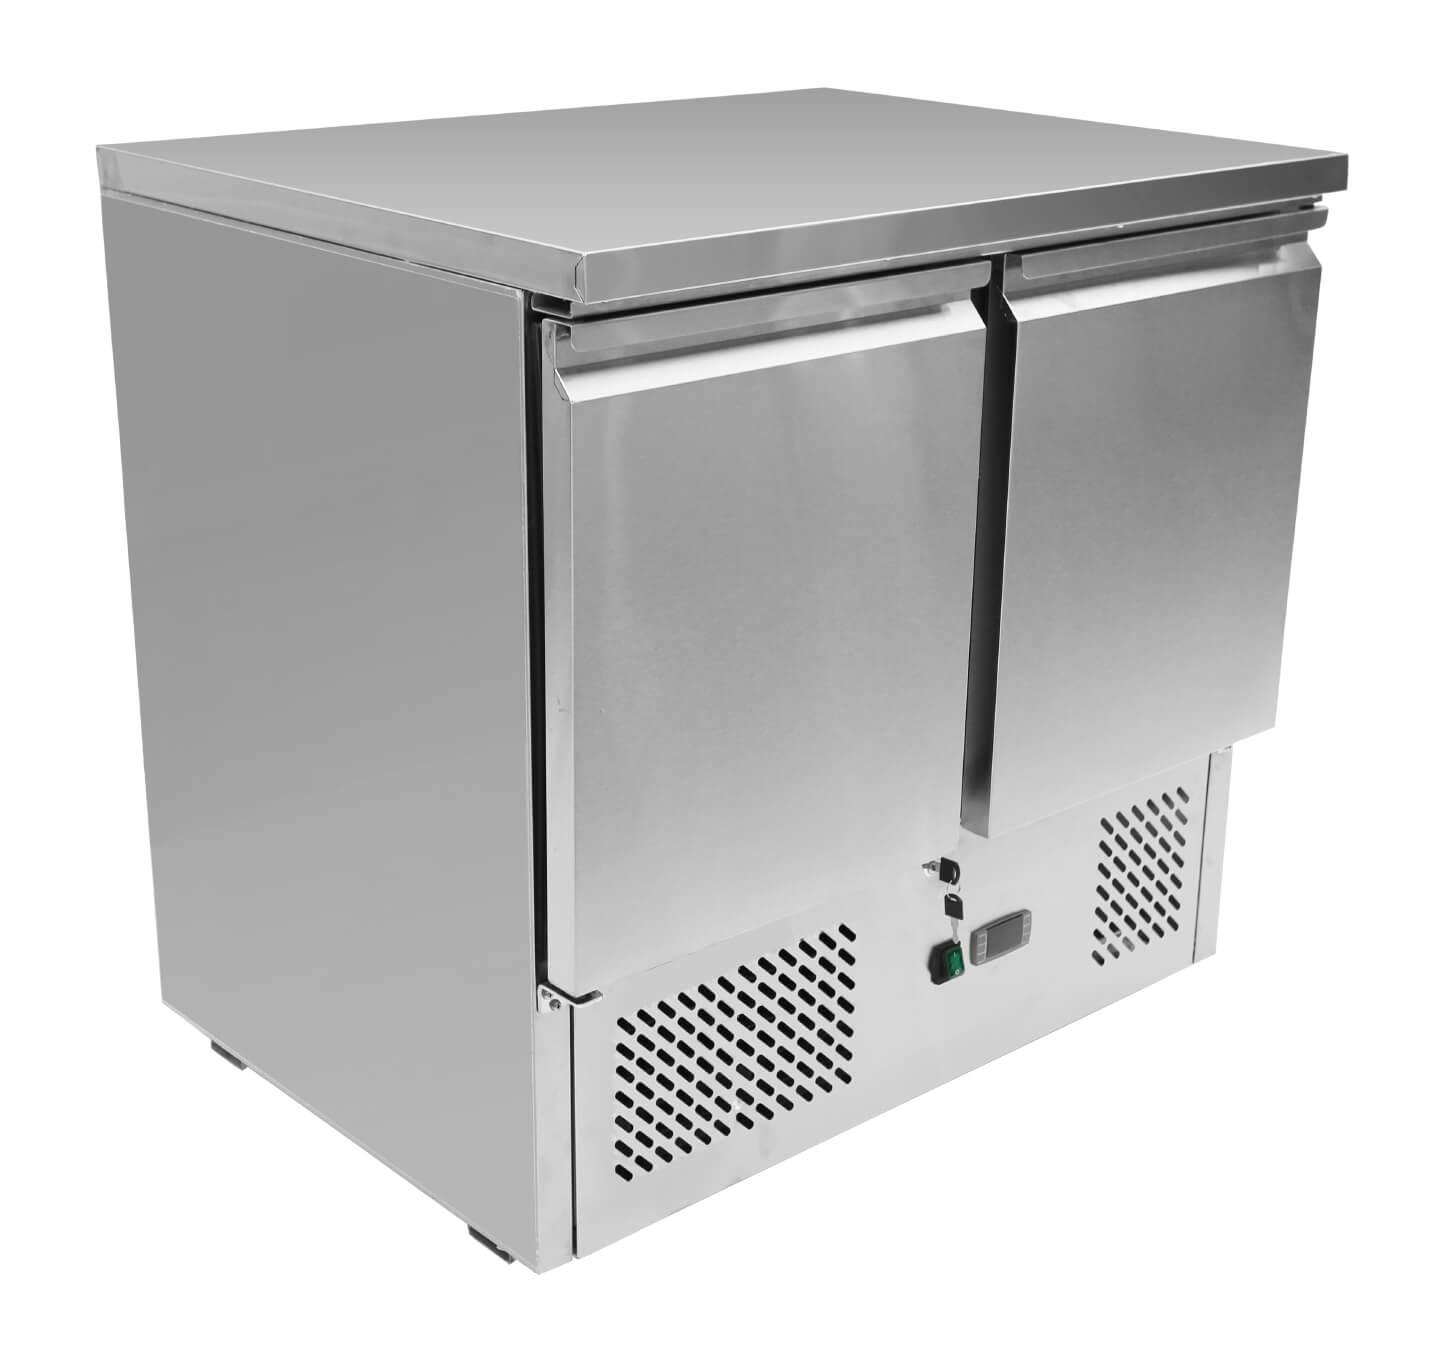 Atosa ESL3801 2 Doors Table Saladette 900 mm